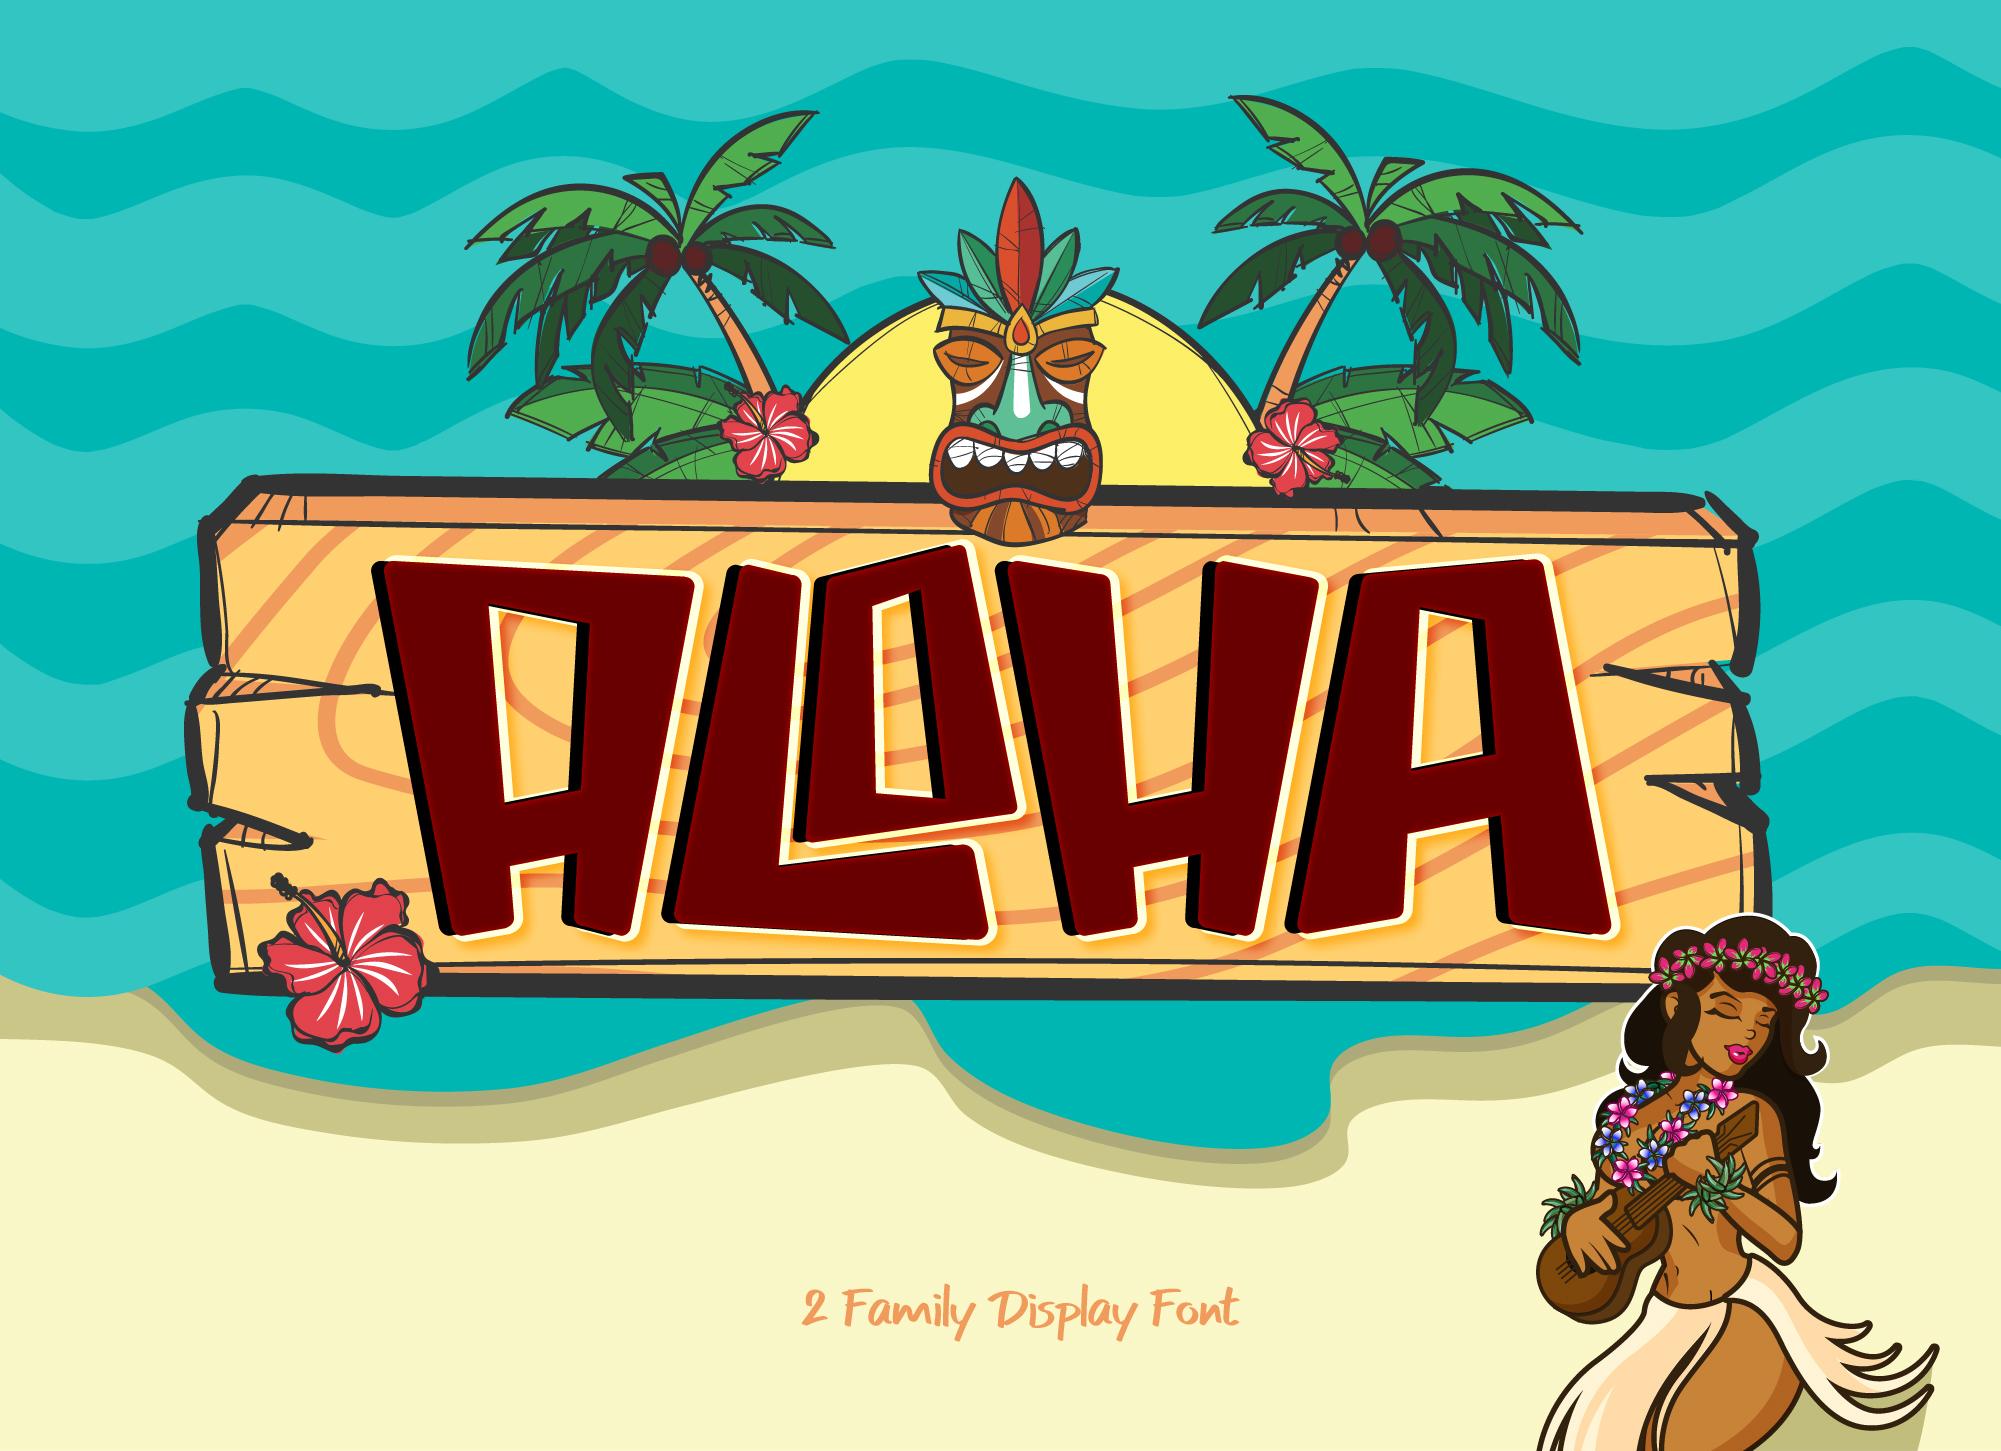 Aloha - Free Display, Fonts | pixelify.net